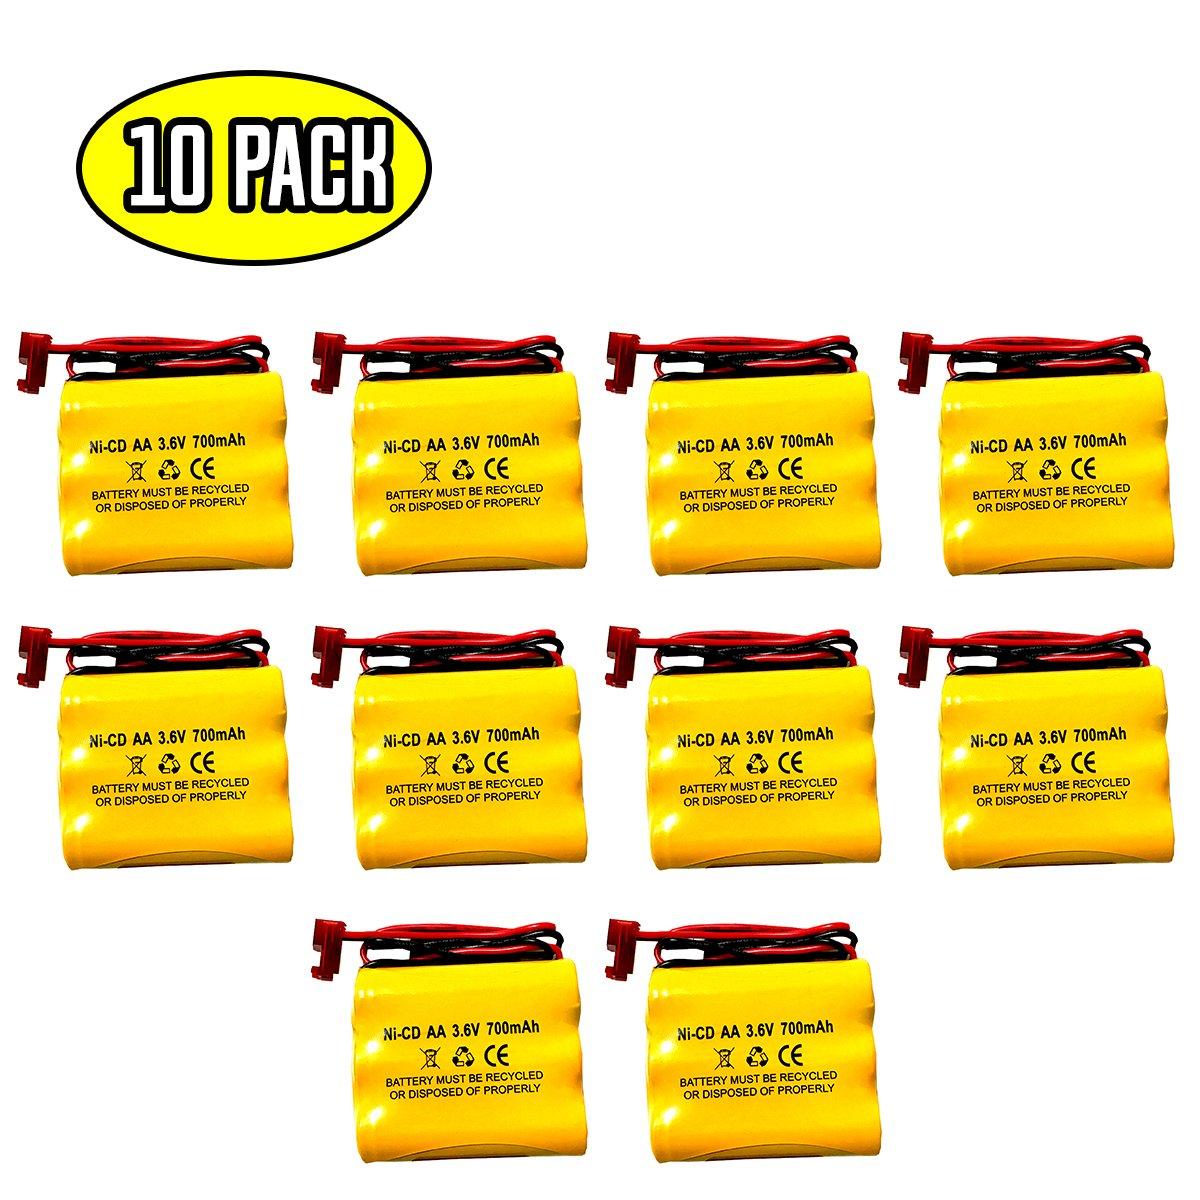 10 Pack BGN800-3DWP-41REC LPX70RWH NNYXSB NIC0553 ANIC0553 41B020AD13301 BNP3700B 3.6v 700mah Ni-Cd Battery Replacement BNP3700B S/L 026-148 Dantona CUSTOM-93 026148 Cooper LPX70RWH Dantona CUSTOM-23 by Battery Hawk